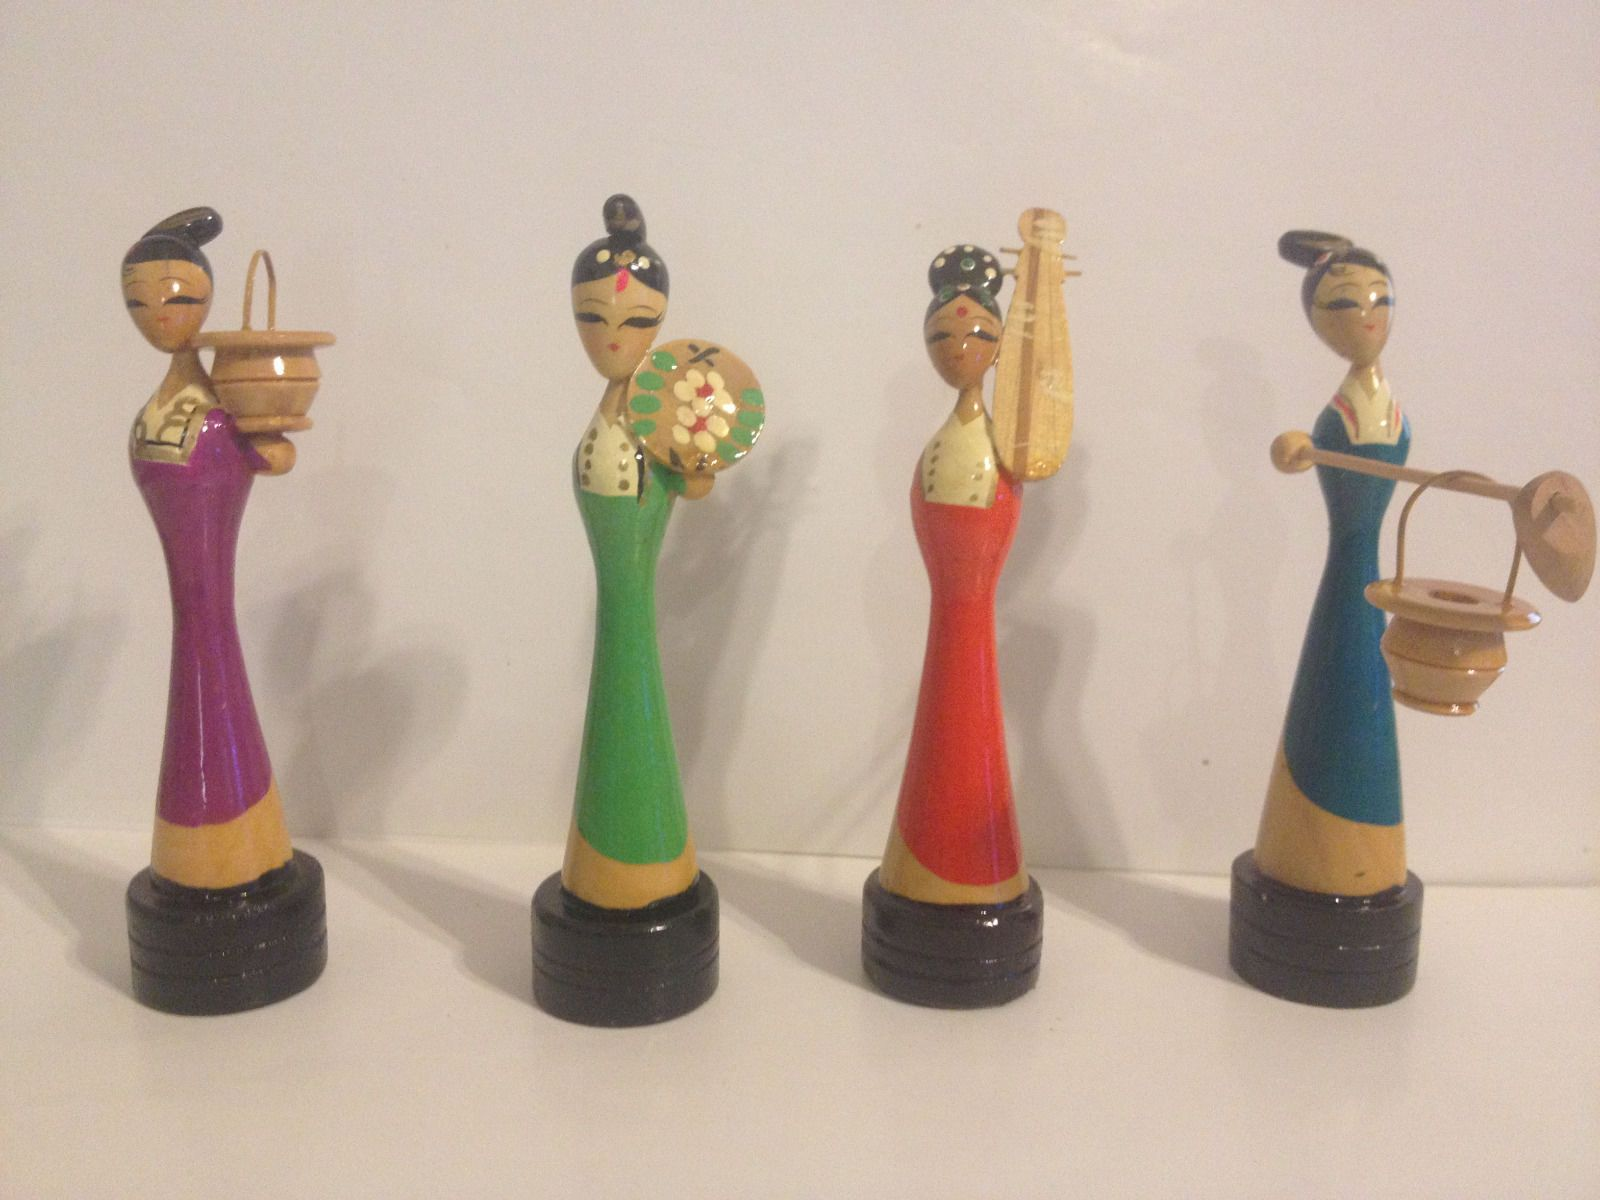 Lot 4 beautiful hand panted hand made Oriental figure vintage pencil sharpeners picclick.com